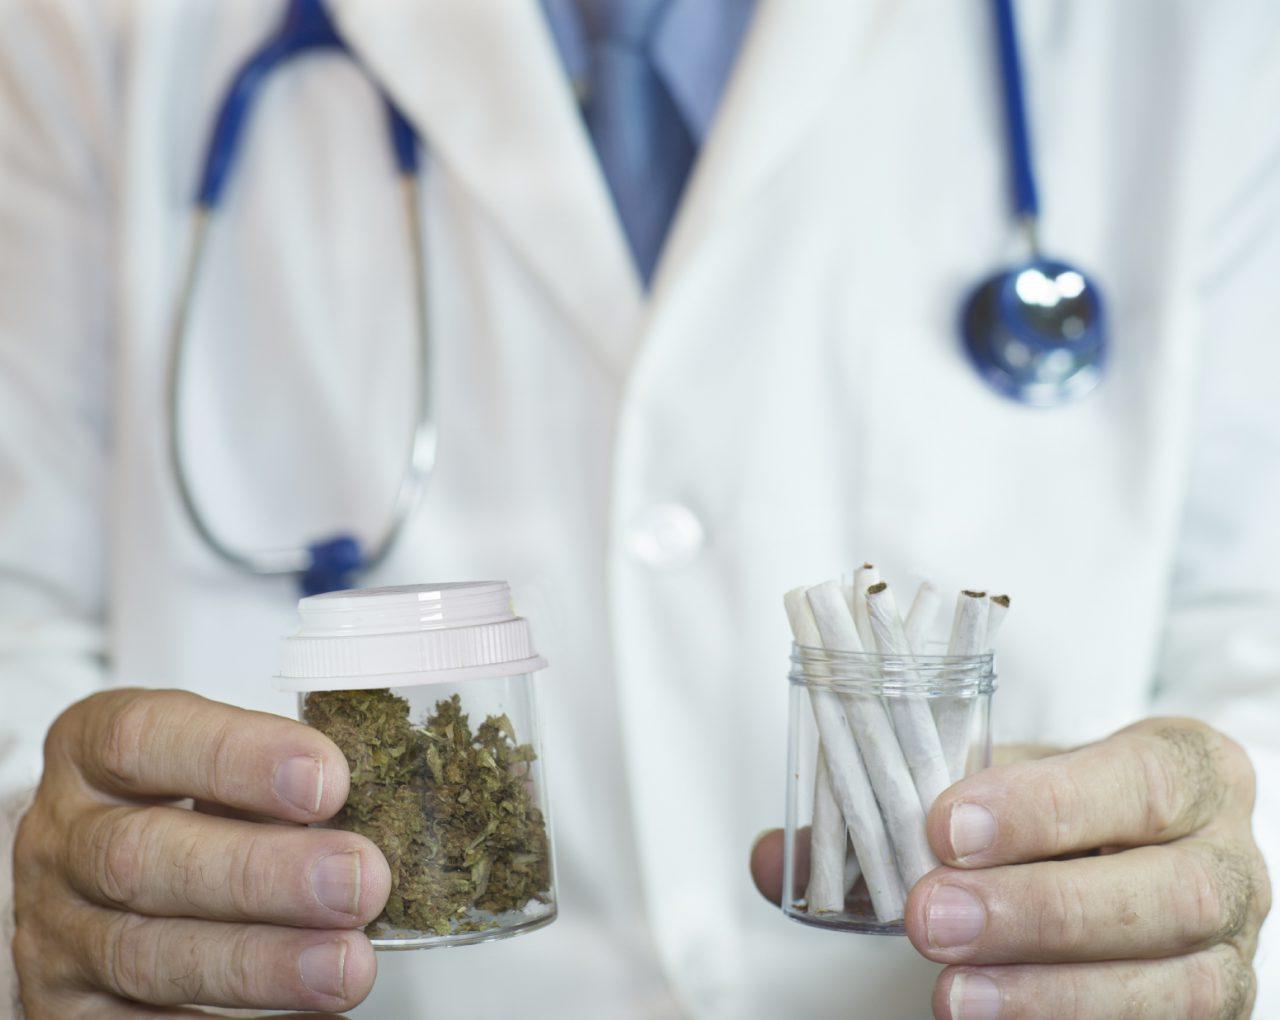 Cholesterol, Caffeine, and Medical Marijuana